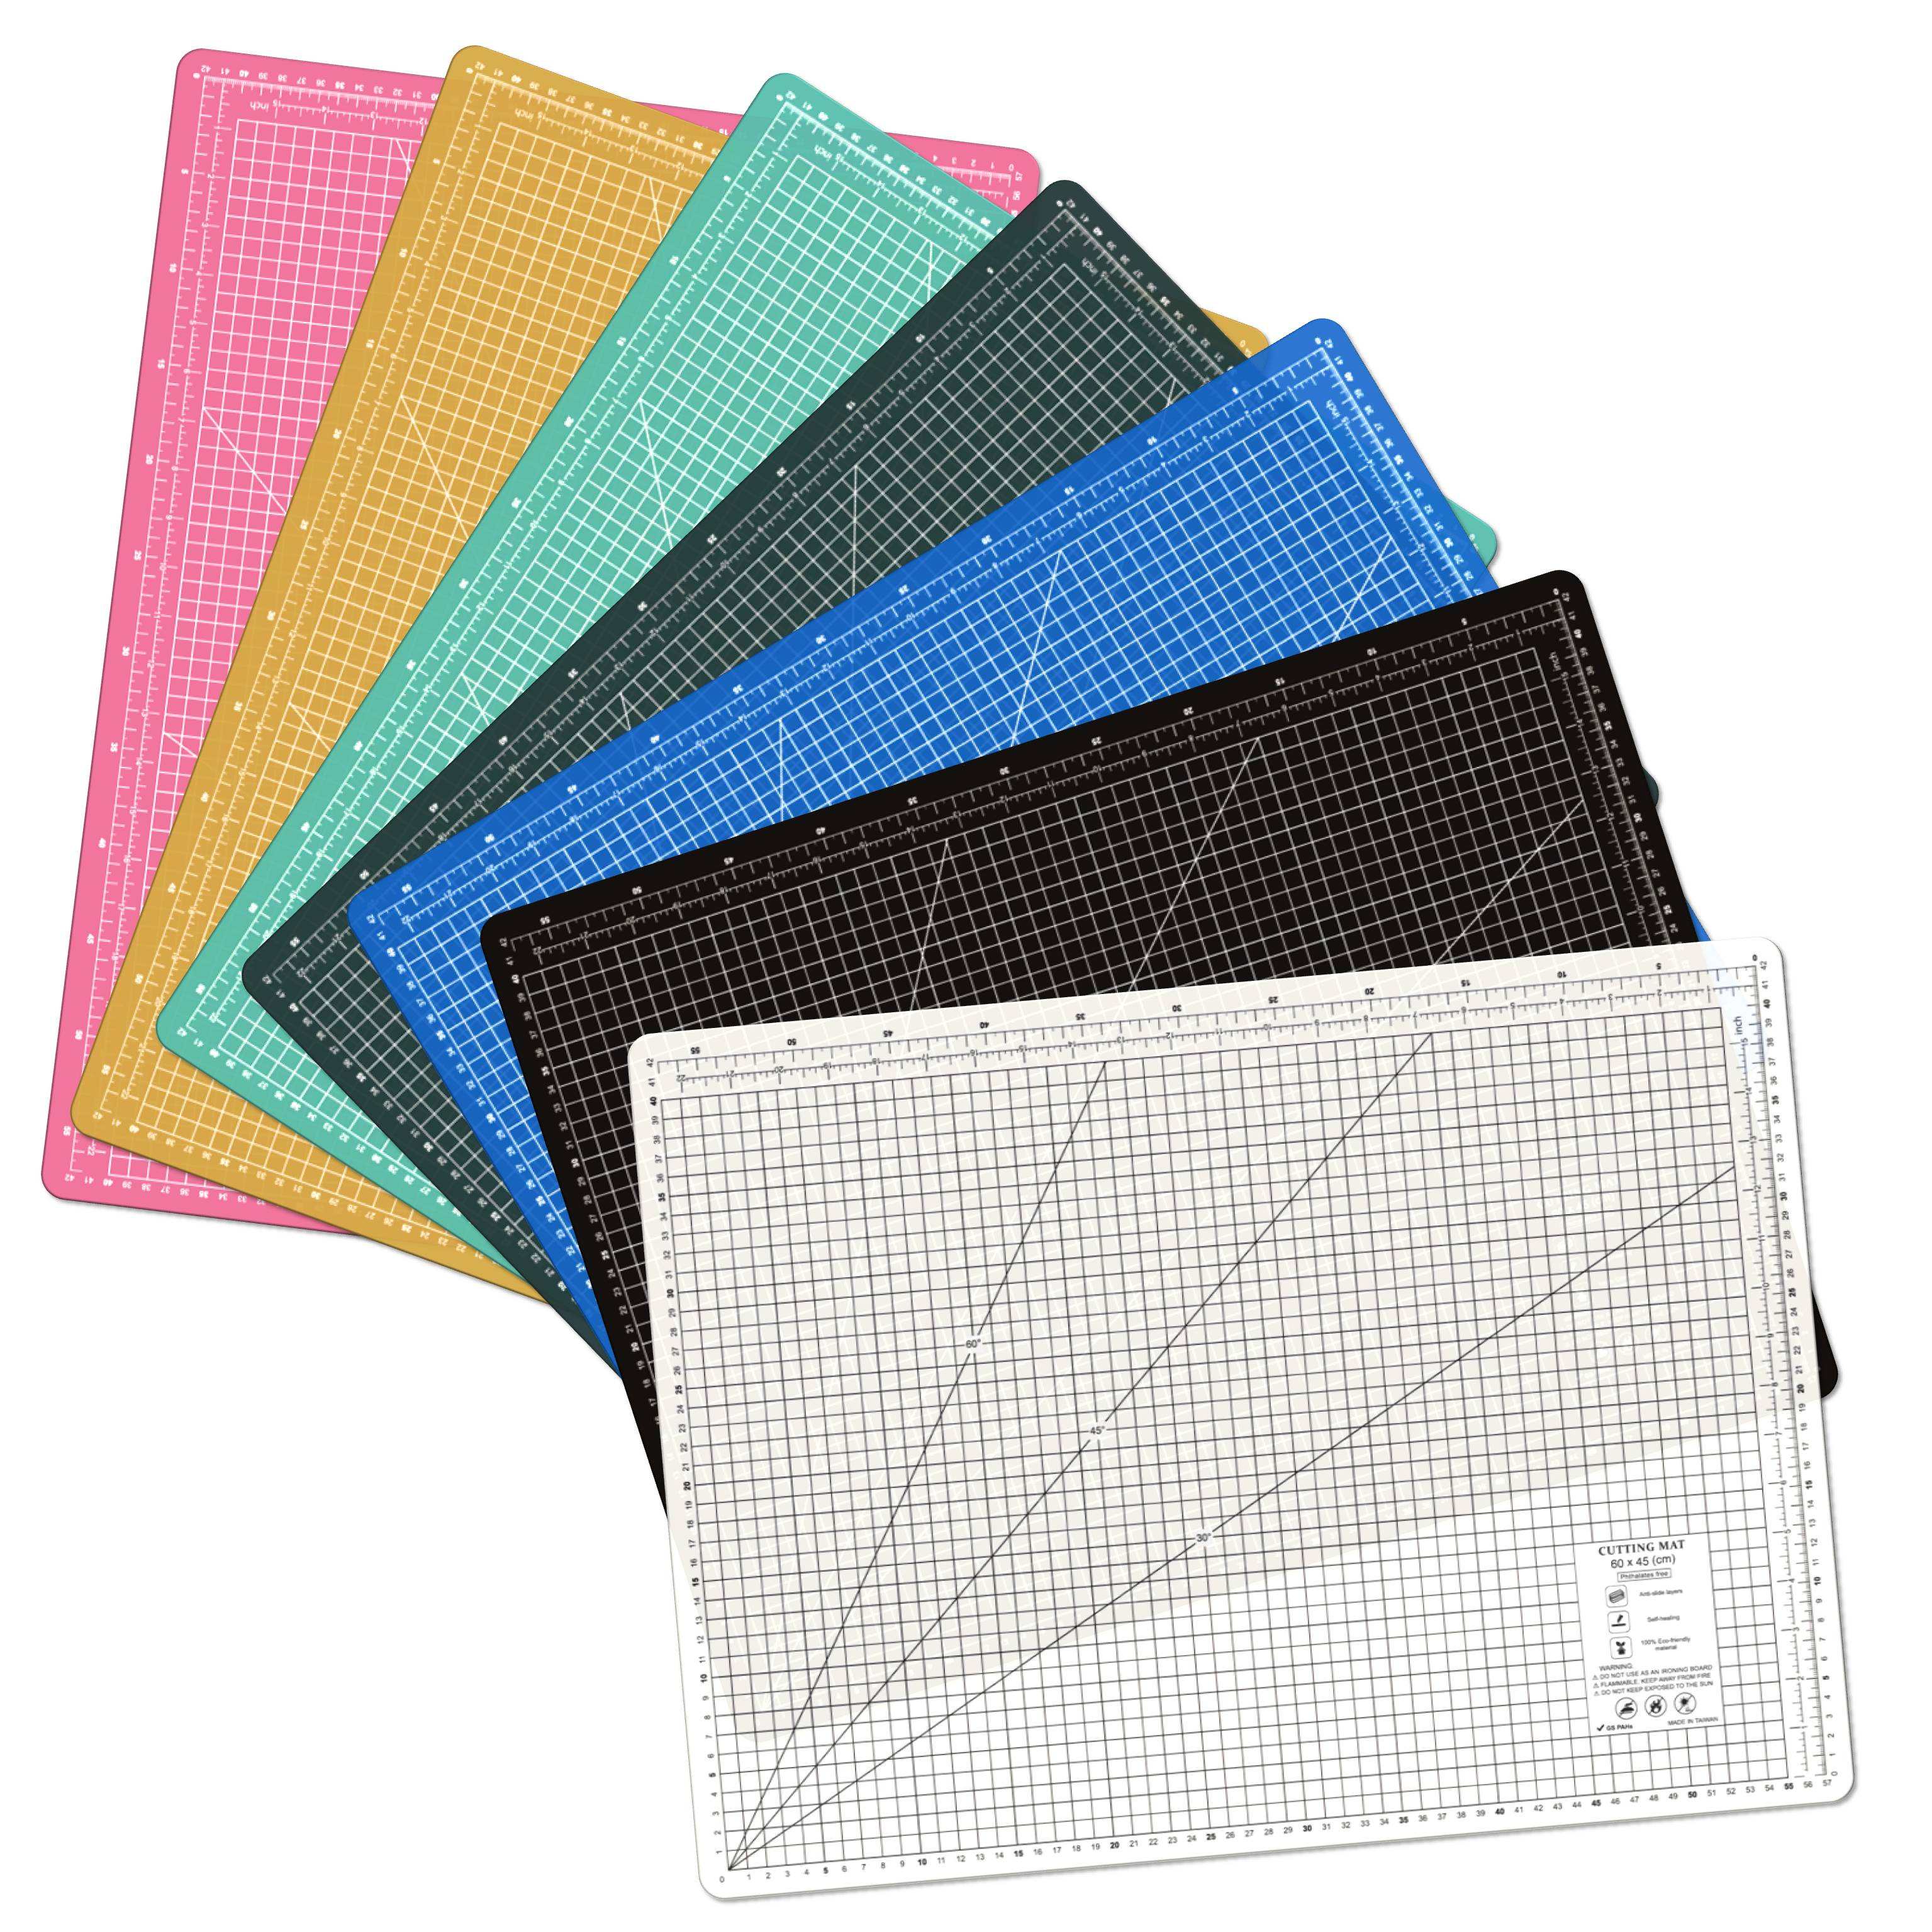 100pcs 30 30cm Satin Napkins Banquet Table Dinner Cloths Pocket Handkerchiefs For Home Party Event Wedding